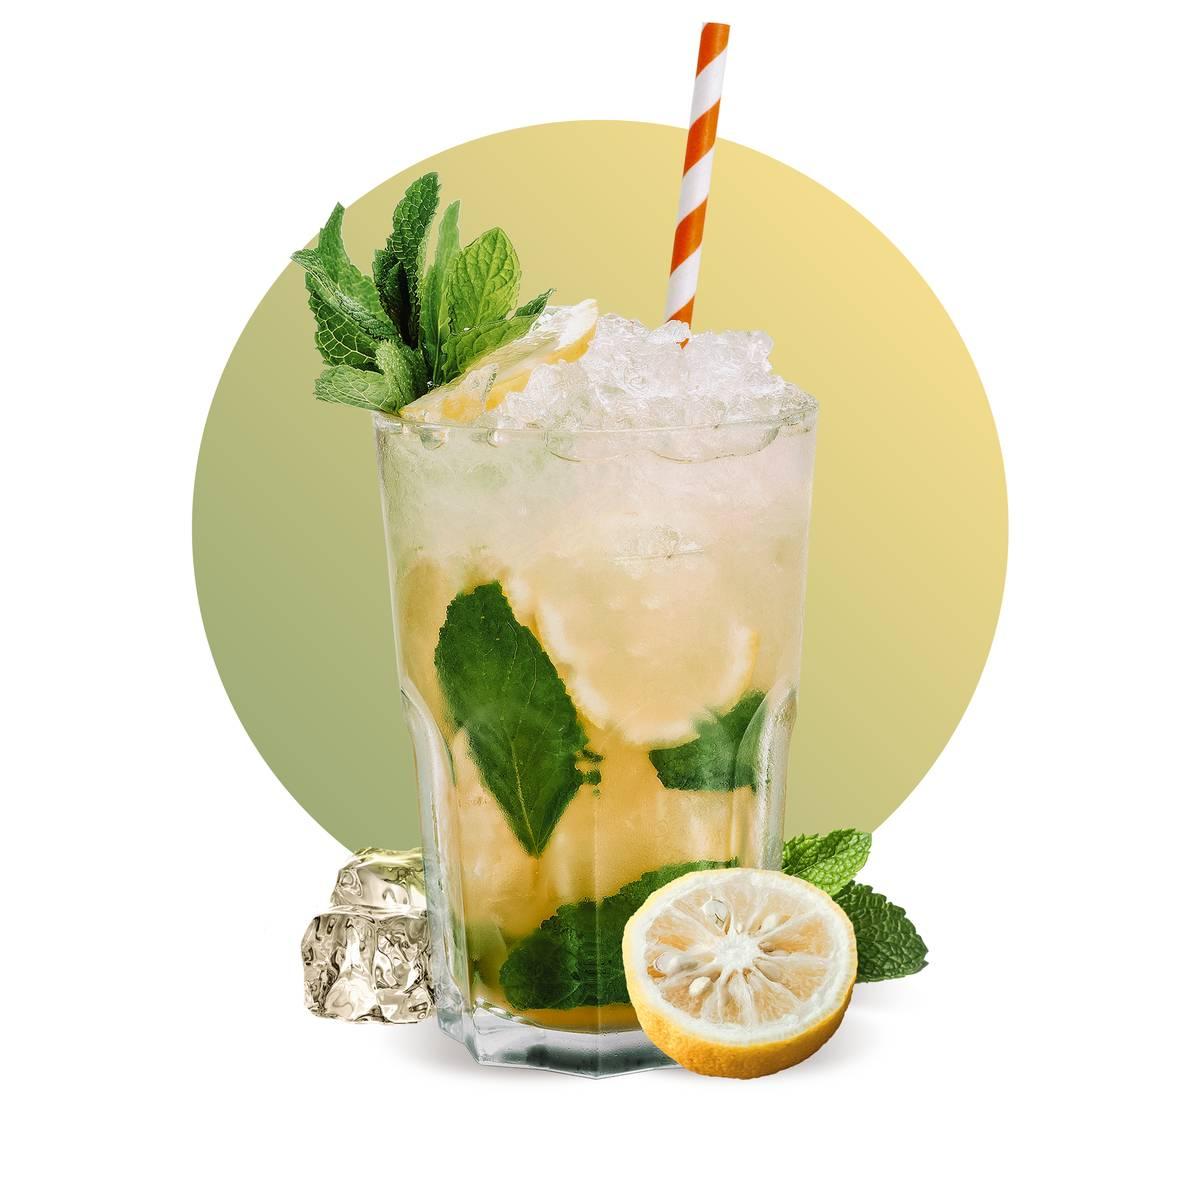 Yuzu Virgin Mojito Drink Recipe